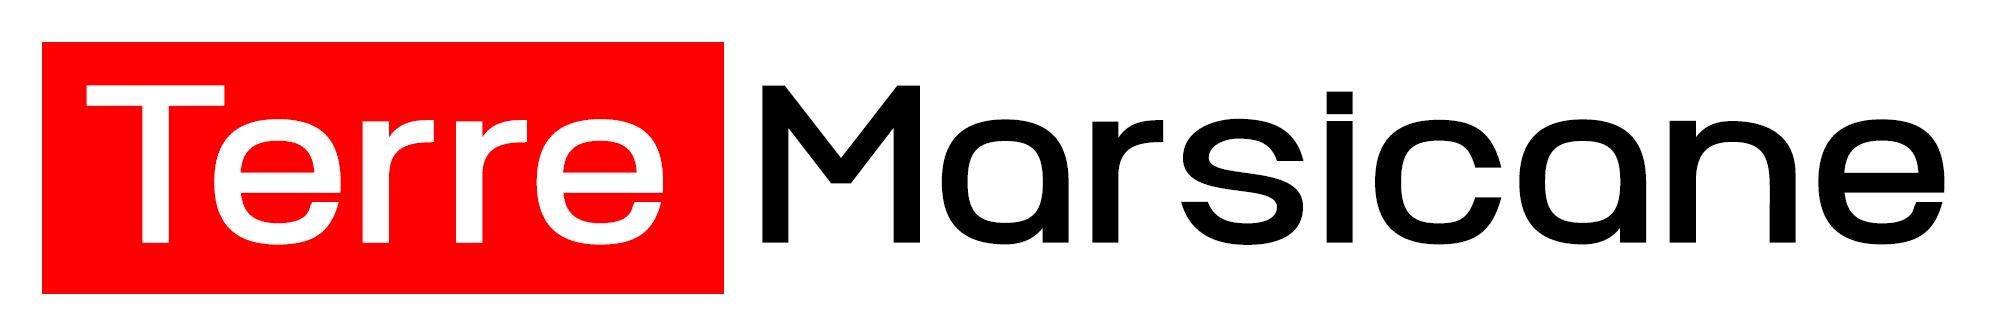 Terre Marsicane